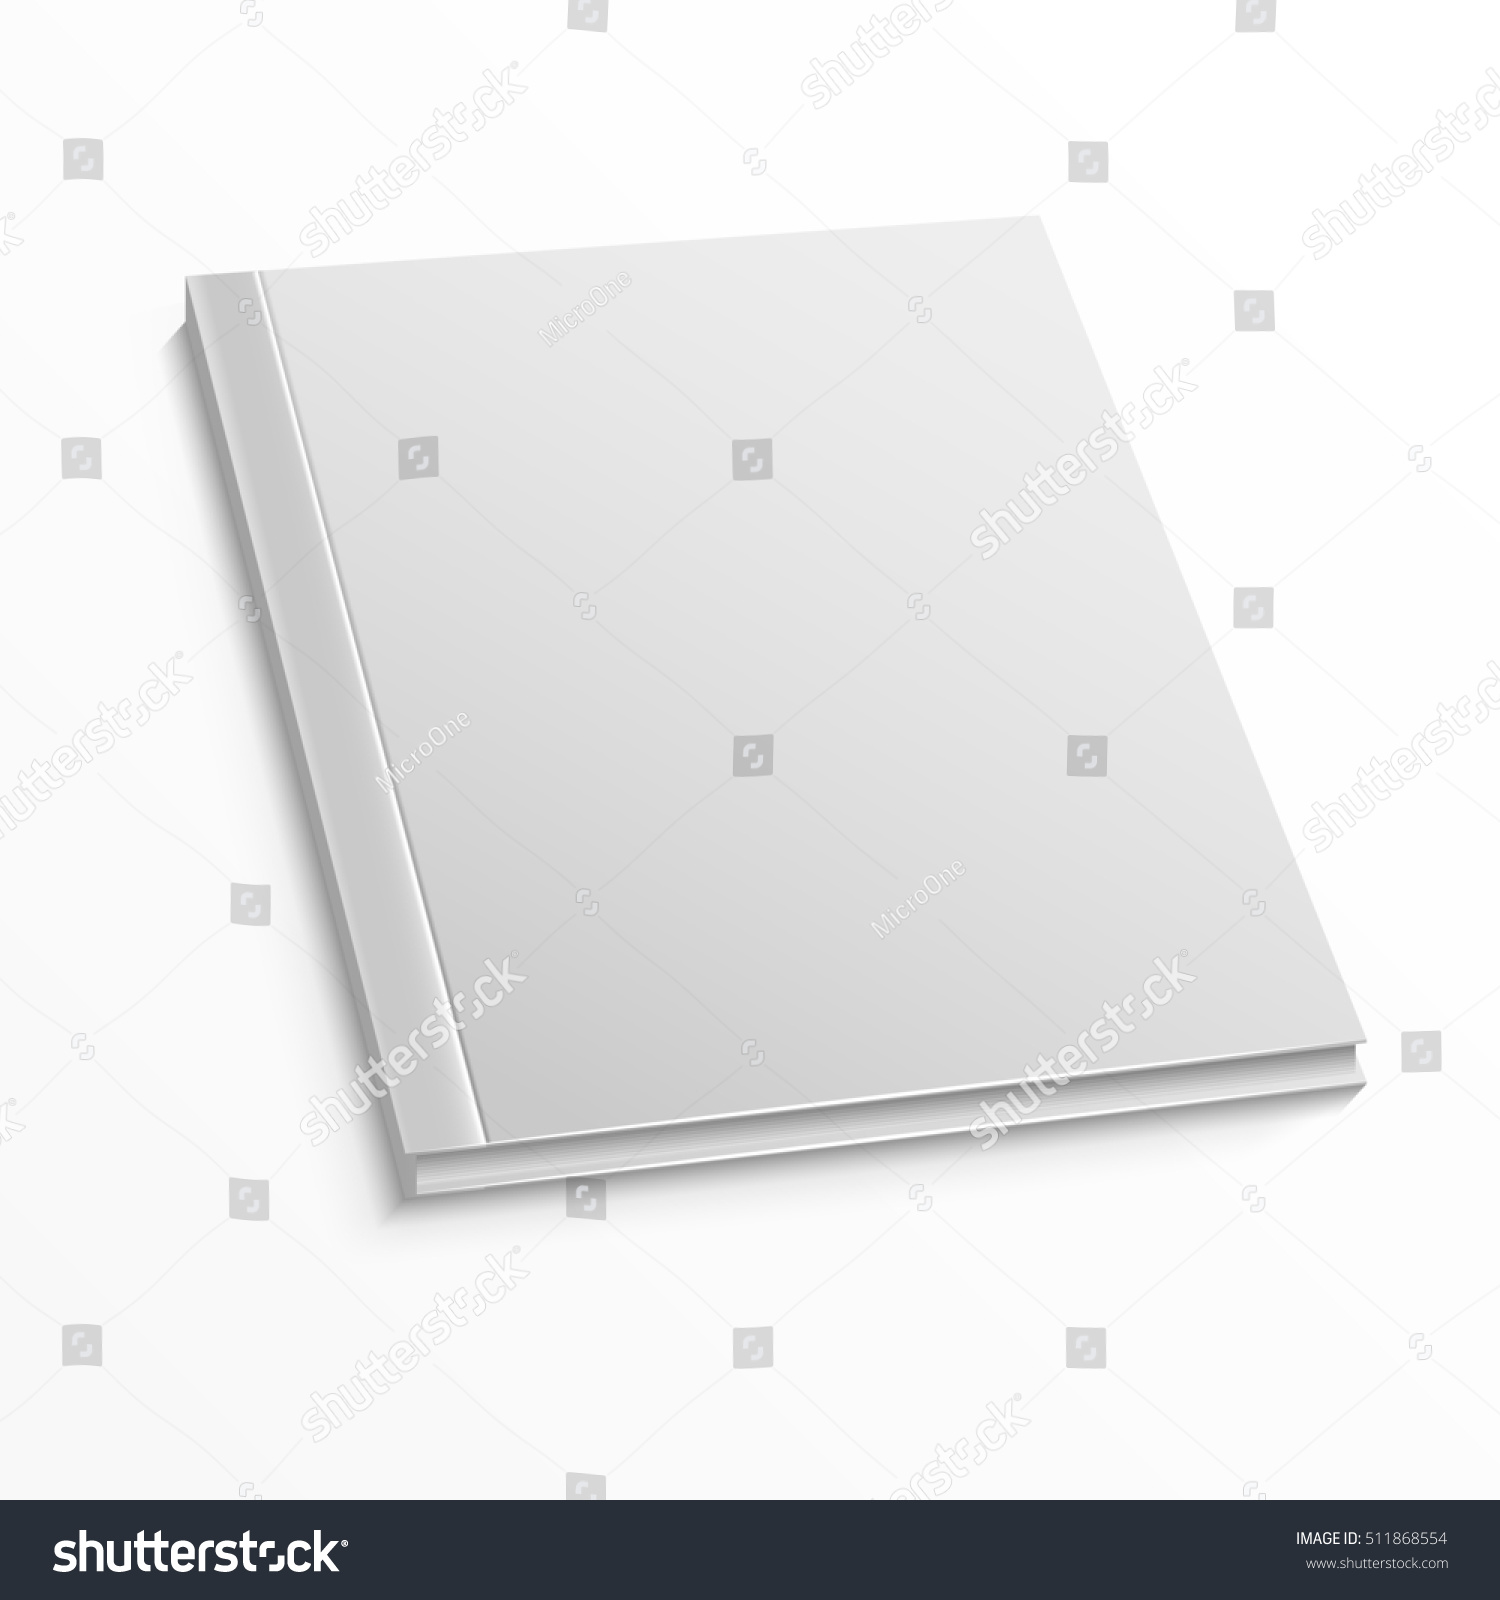 blank magazine cover template on white stock illustration 511868554